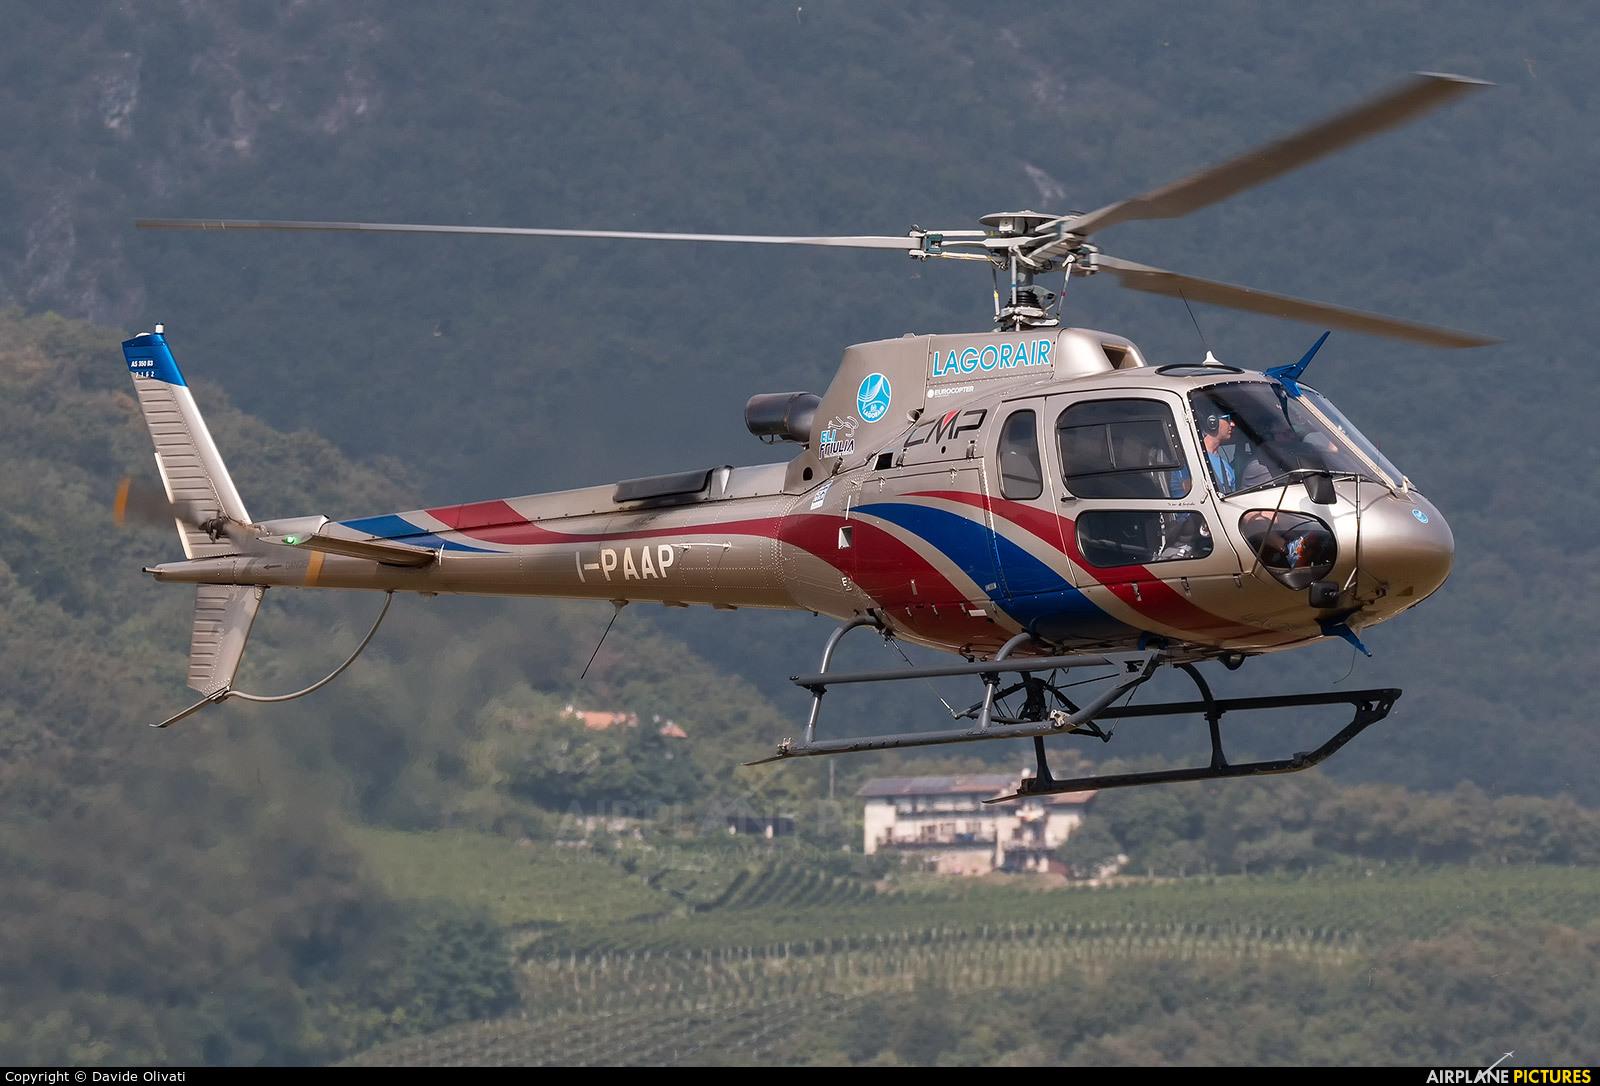 Private I-PAAP aircraft at Trento - Mattarello